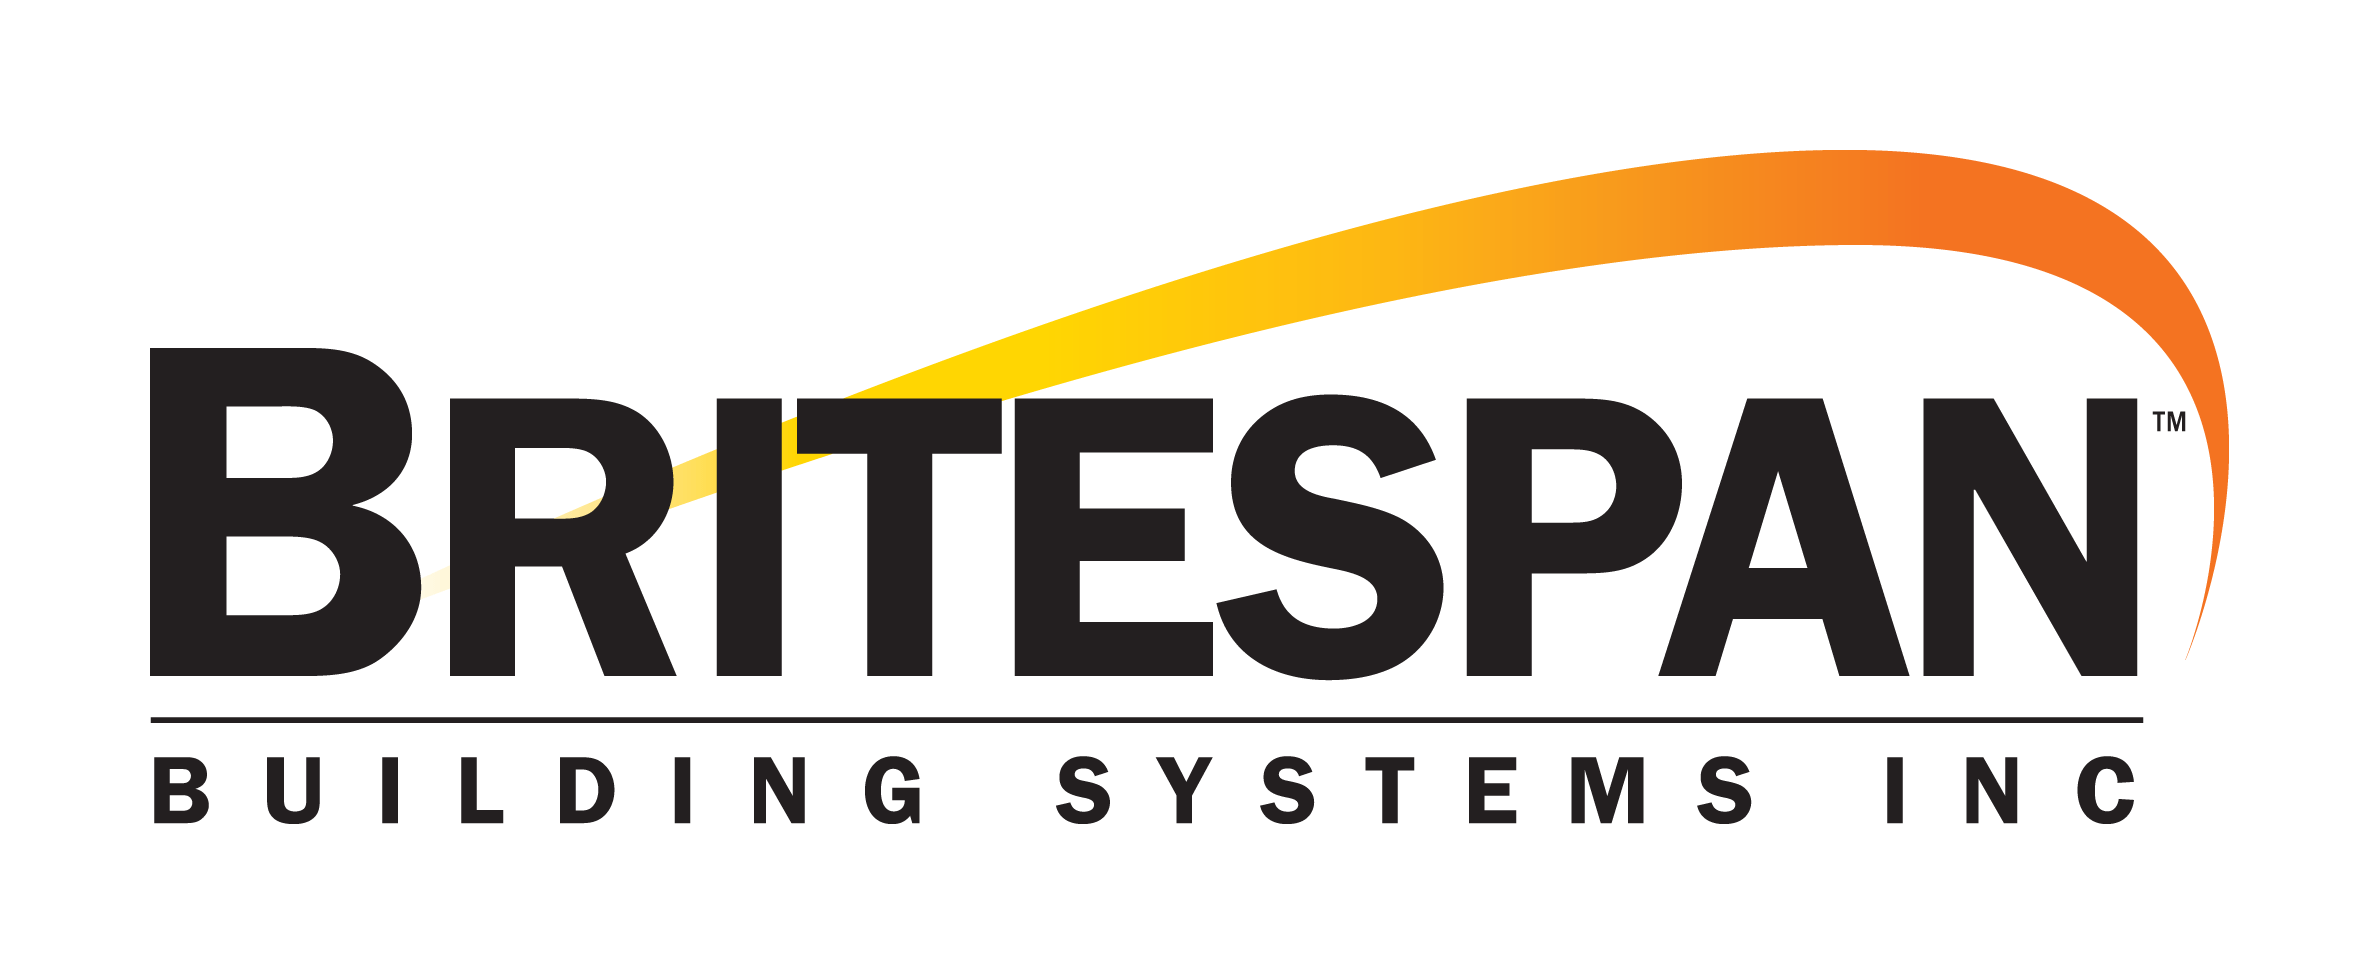 BritespanBuildings Systems Inc